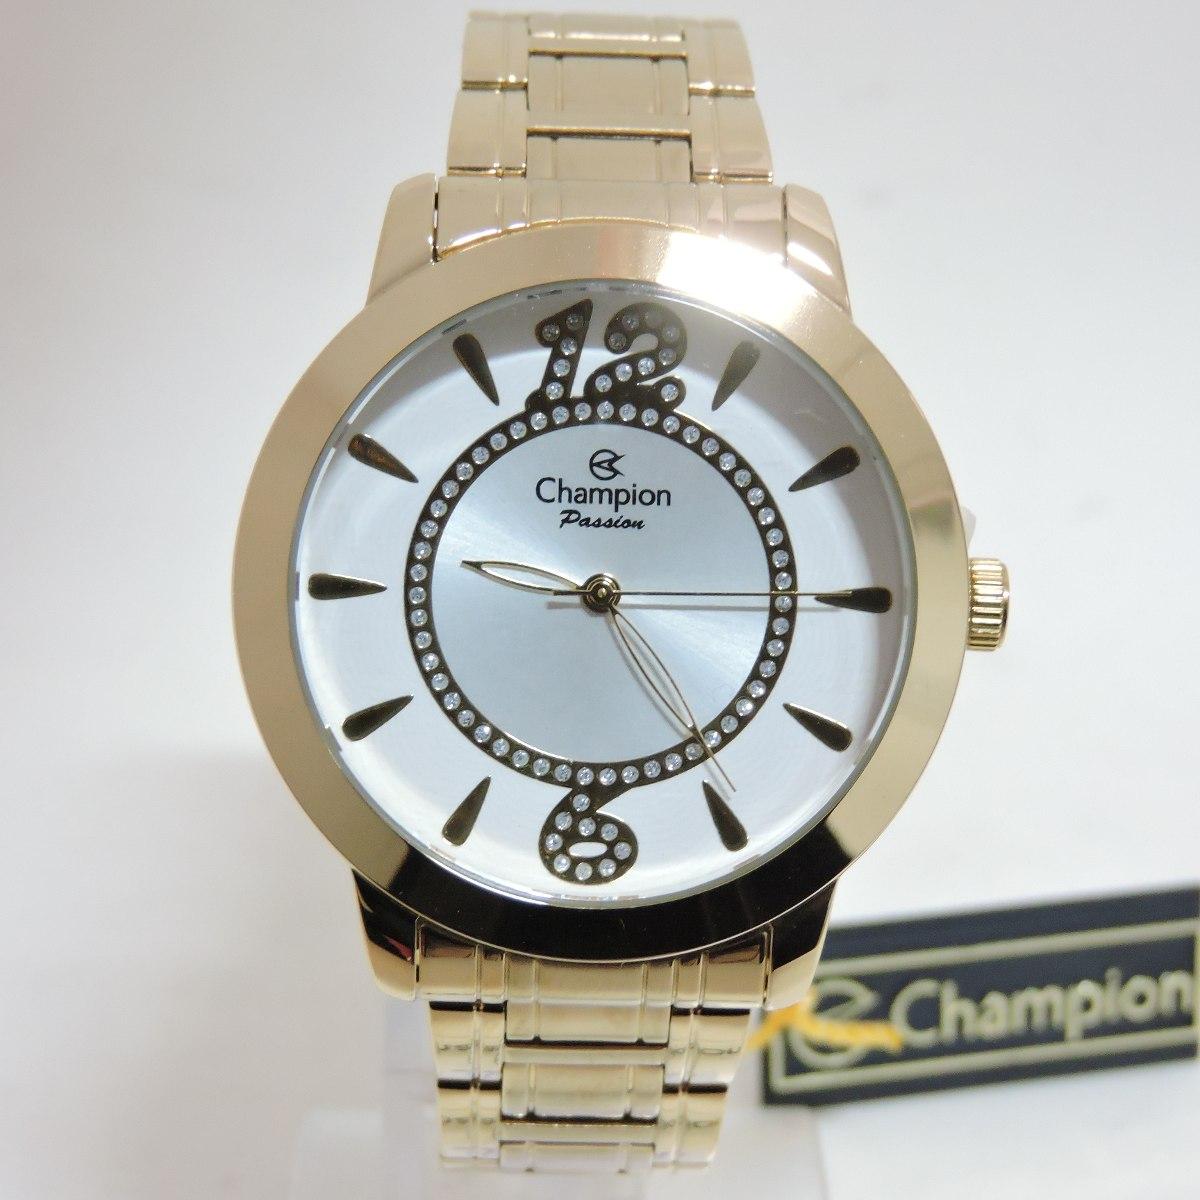 bcd70a446b relógio champion feminino passion dourado ch24259h · relógio champion  feminino. Carregando zoom.